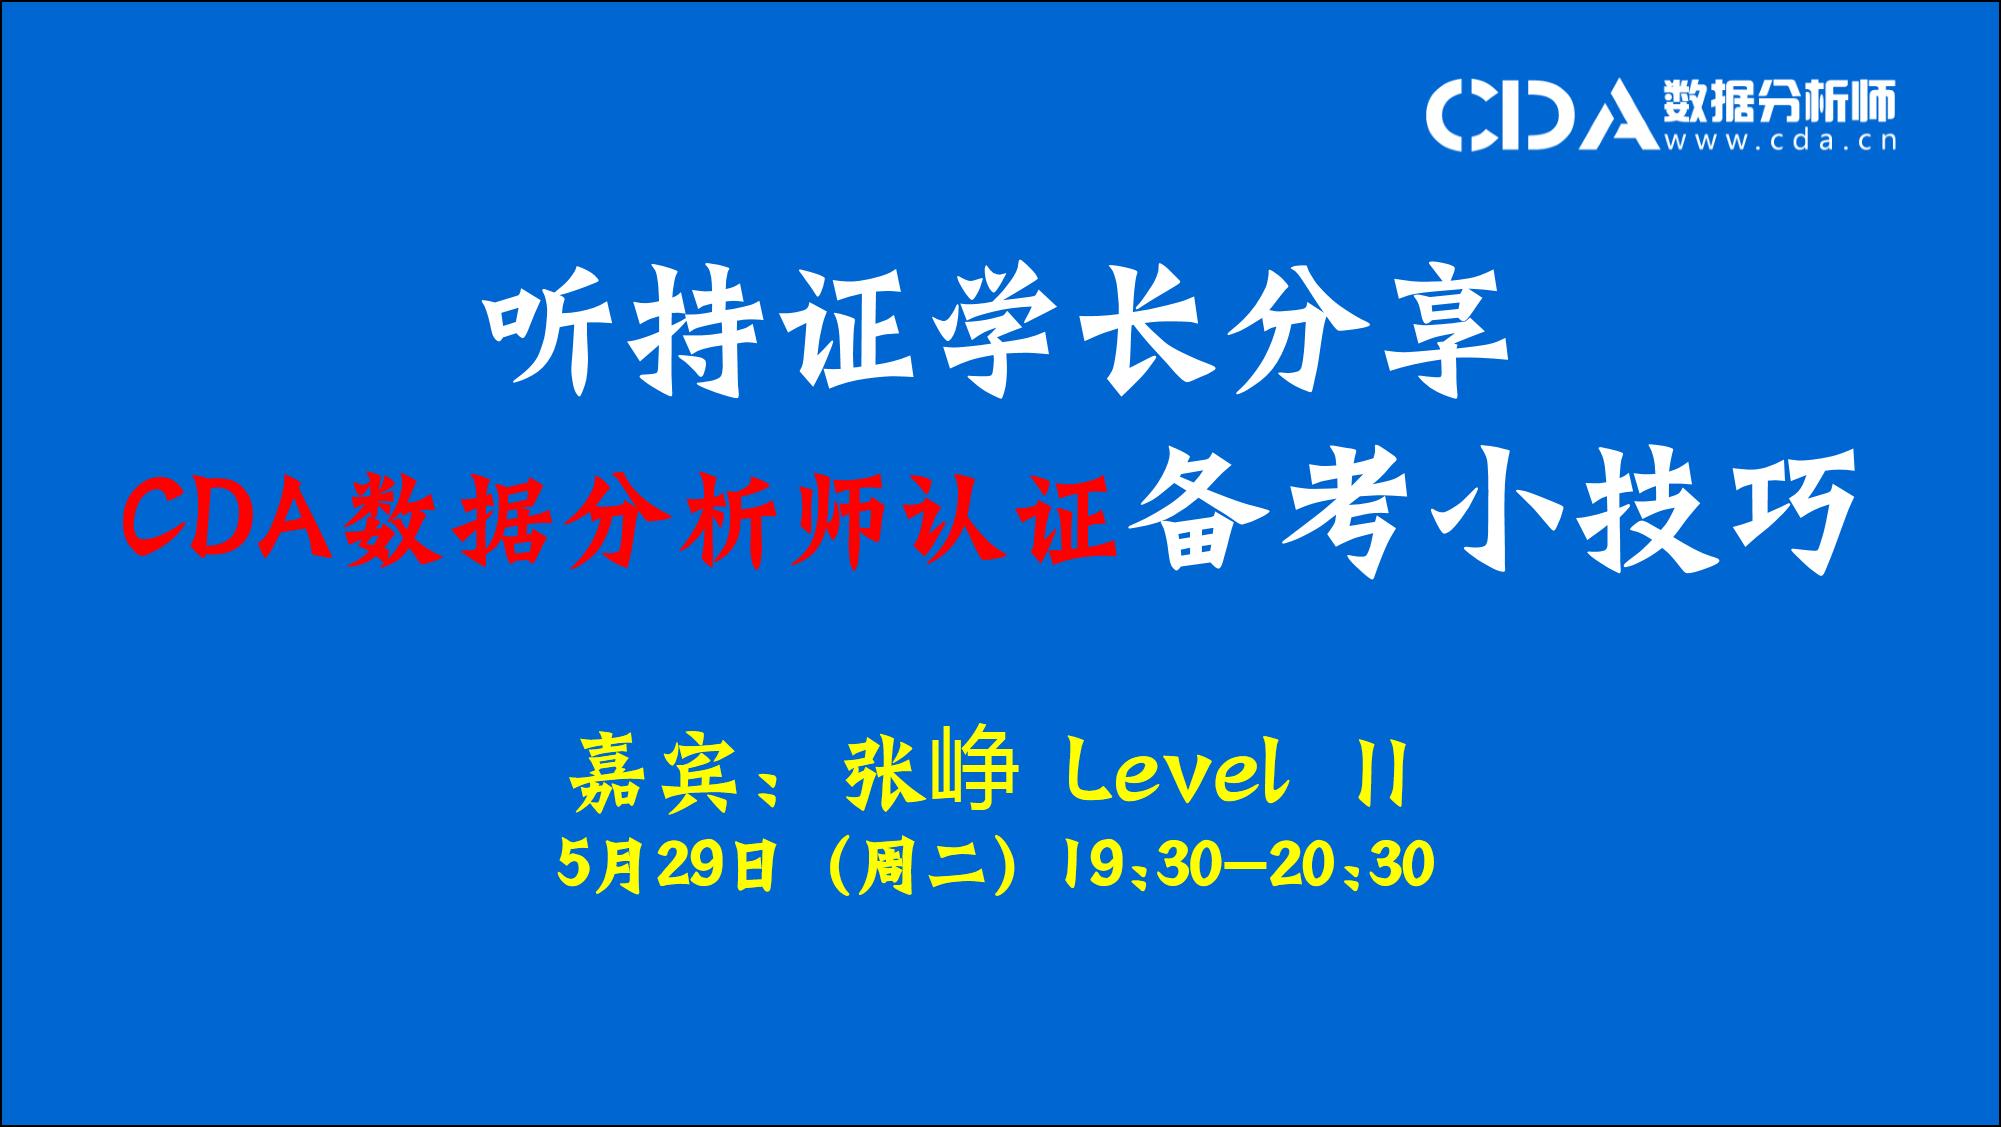 [CDA考试]听持证学姐分享CDA二级建模备考小技巧